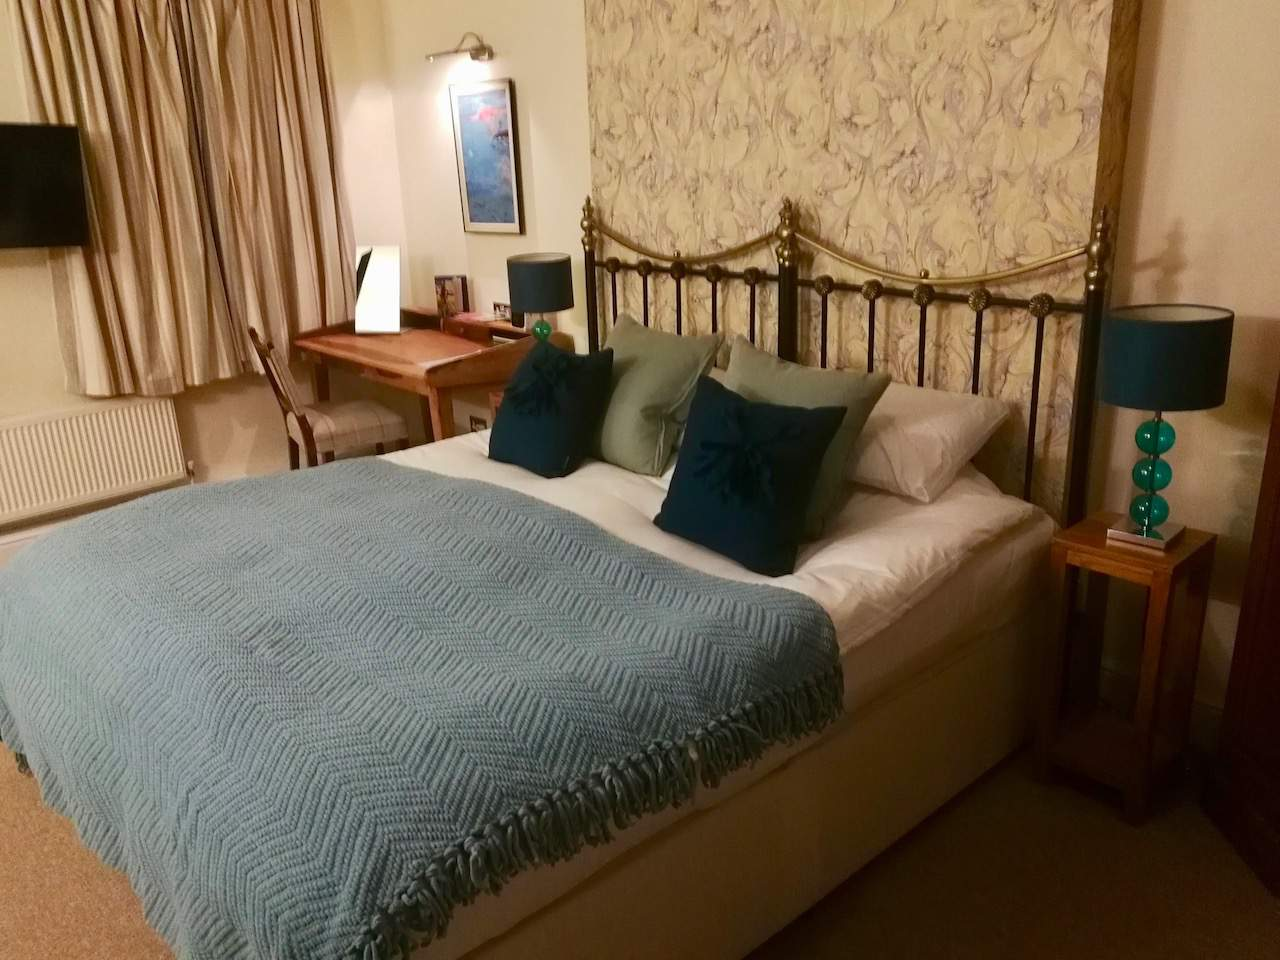 Dorset Blue room at La Fosse